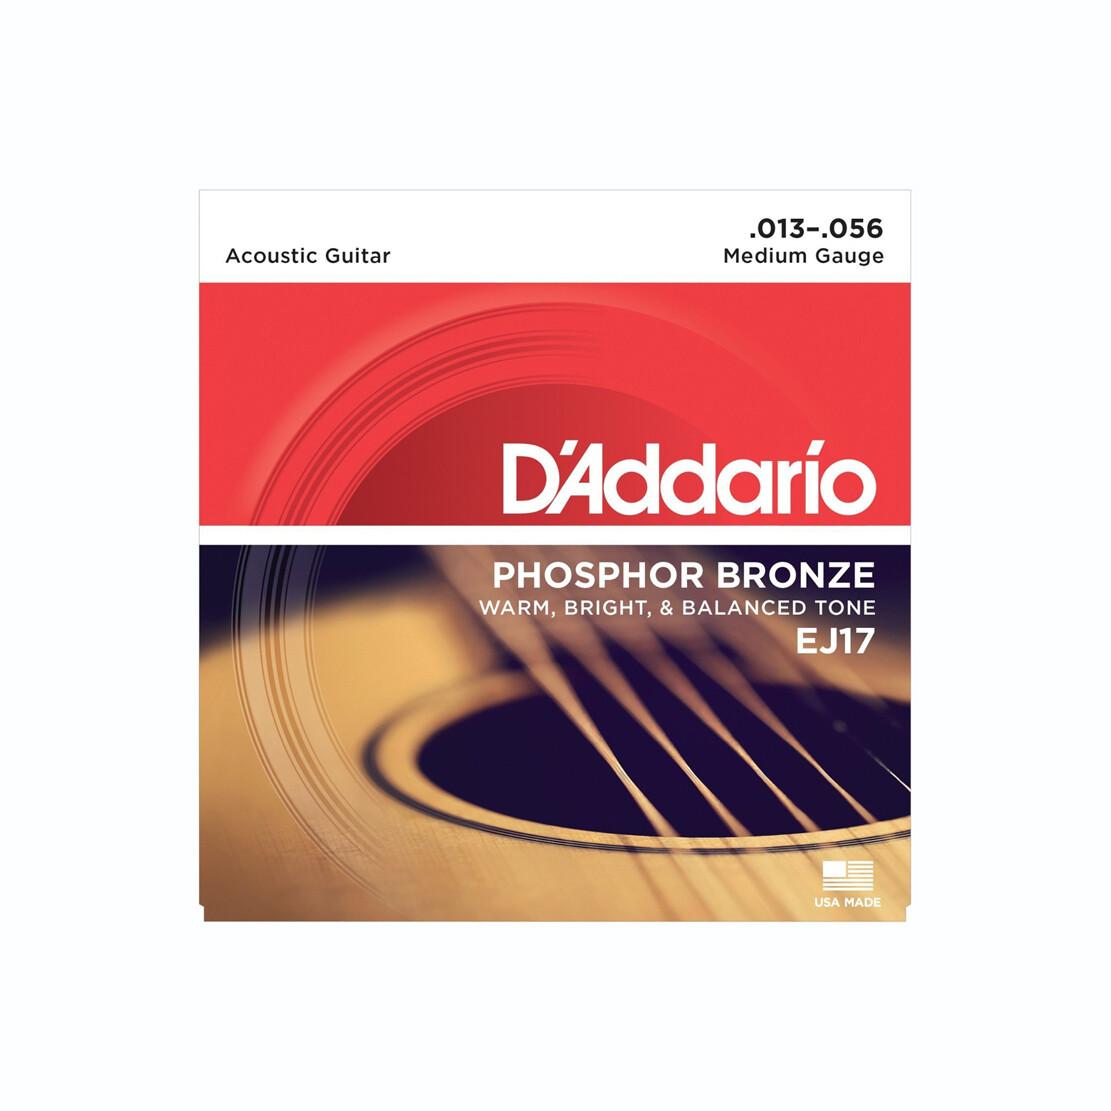 D'Addario EJ17-3D Phosphor Bronze Acoustic Guitar Strings, Medium, 13-56